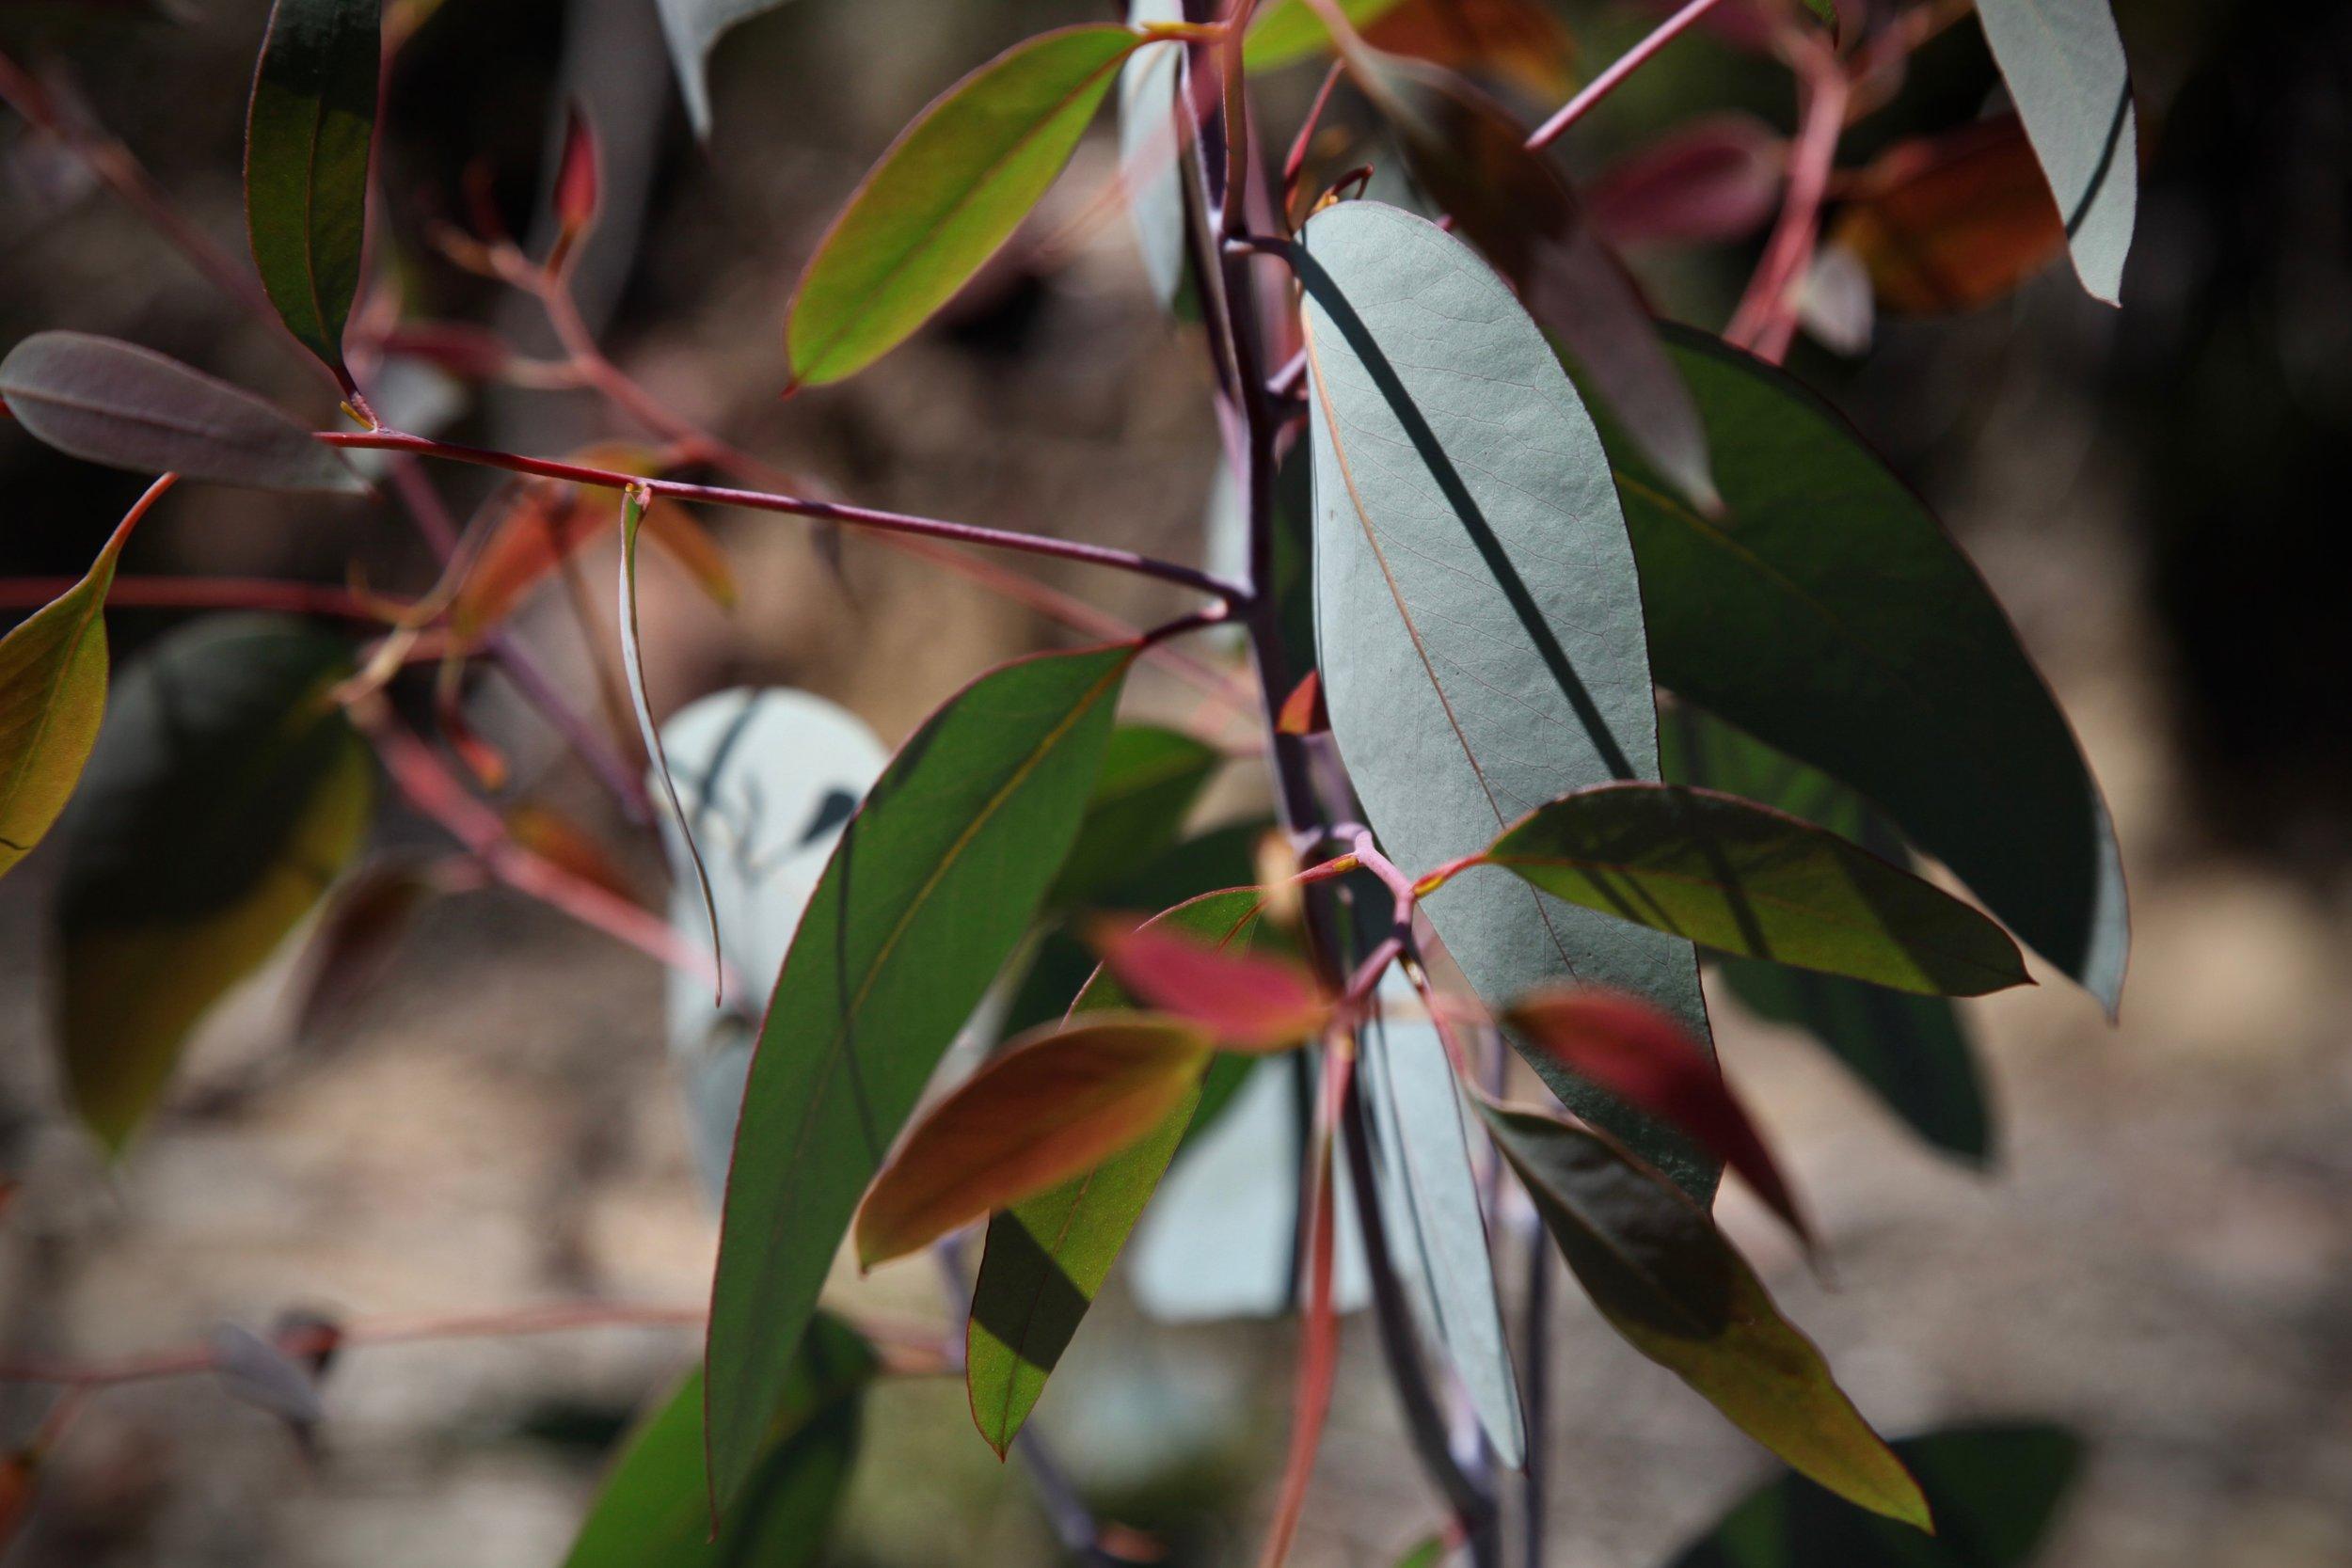 narrow-neck-leafs.jpg